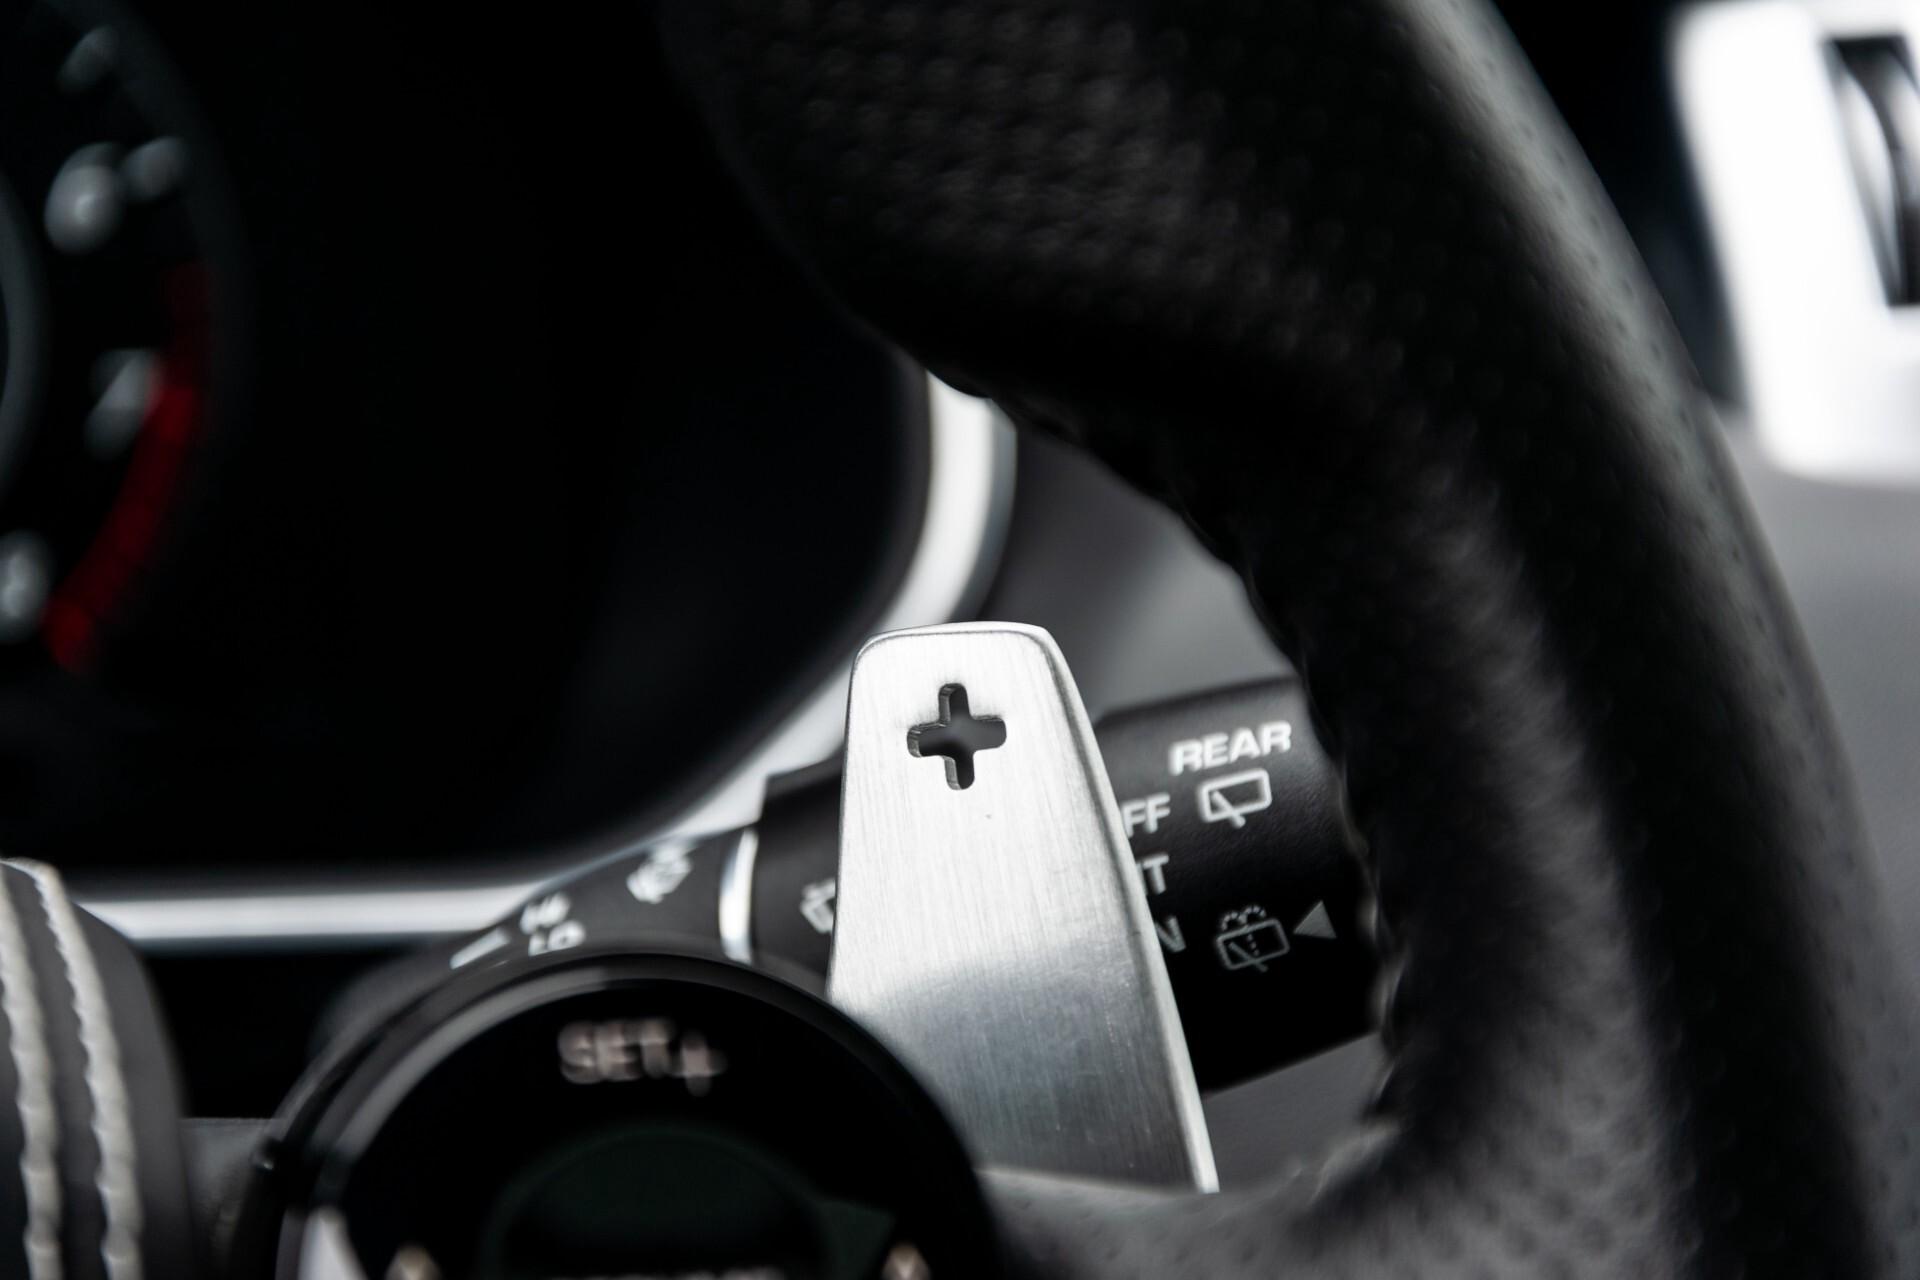 Land Rover Range Rover Sport SVR 5.0 Supercharged 575pk Full Carbon Nieuwprijs €241377 Foto 13